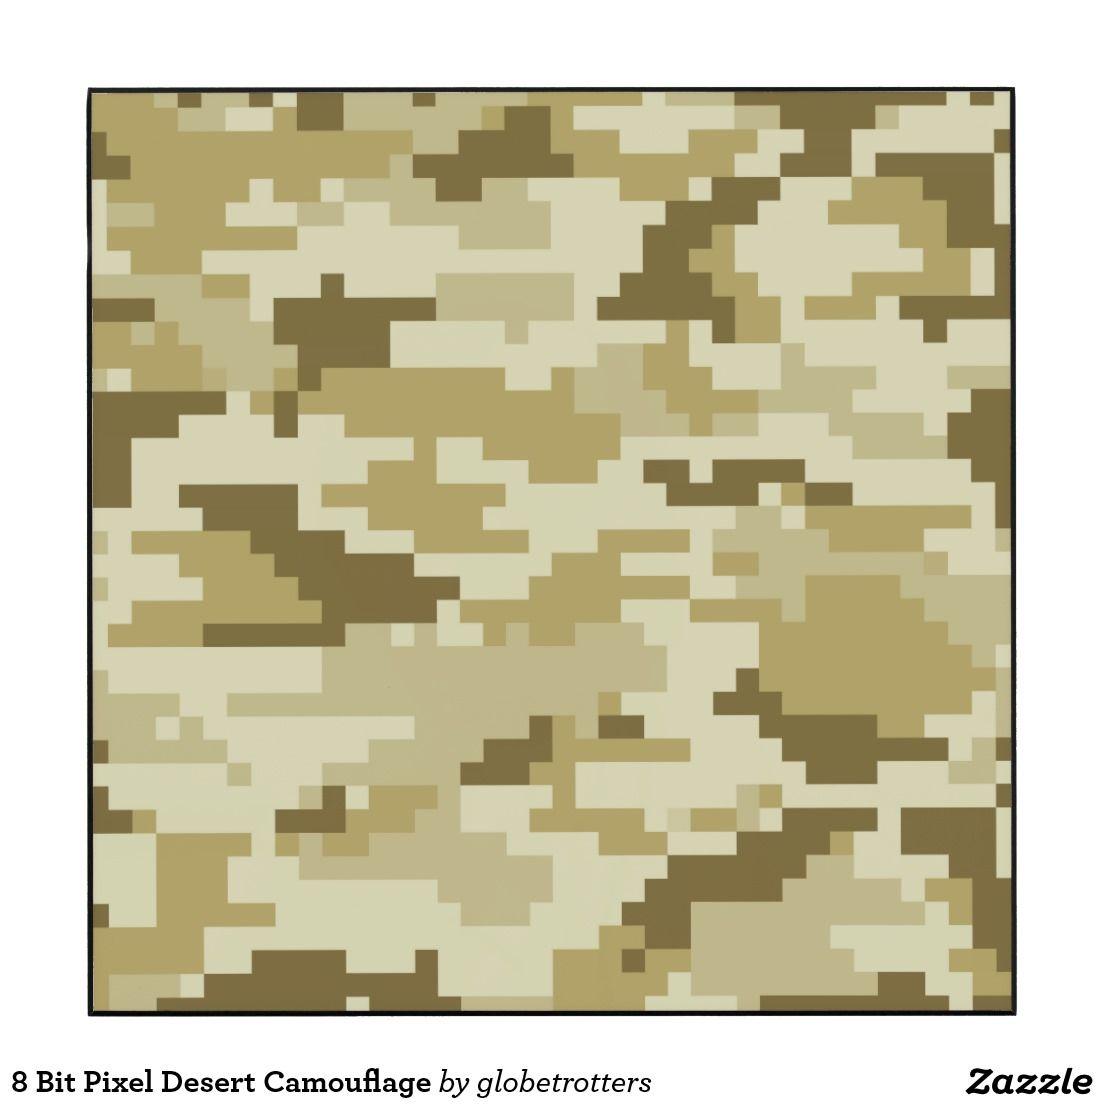 8 Bit Pixel Desert Camouflage / Camo Wood Print | Camouflage, Wood ...